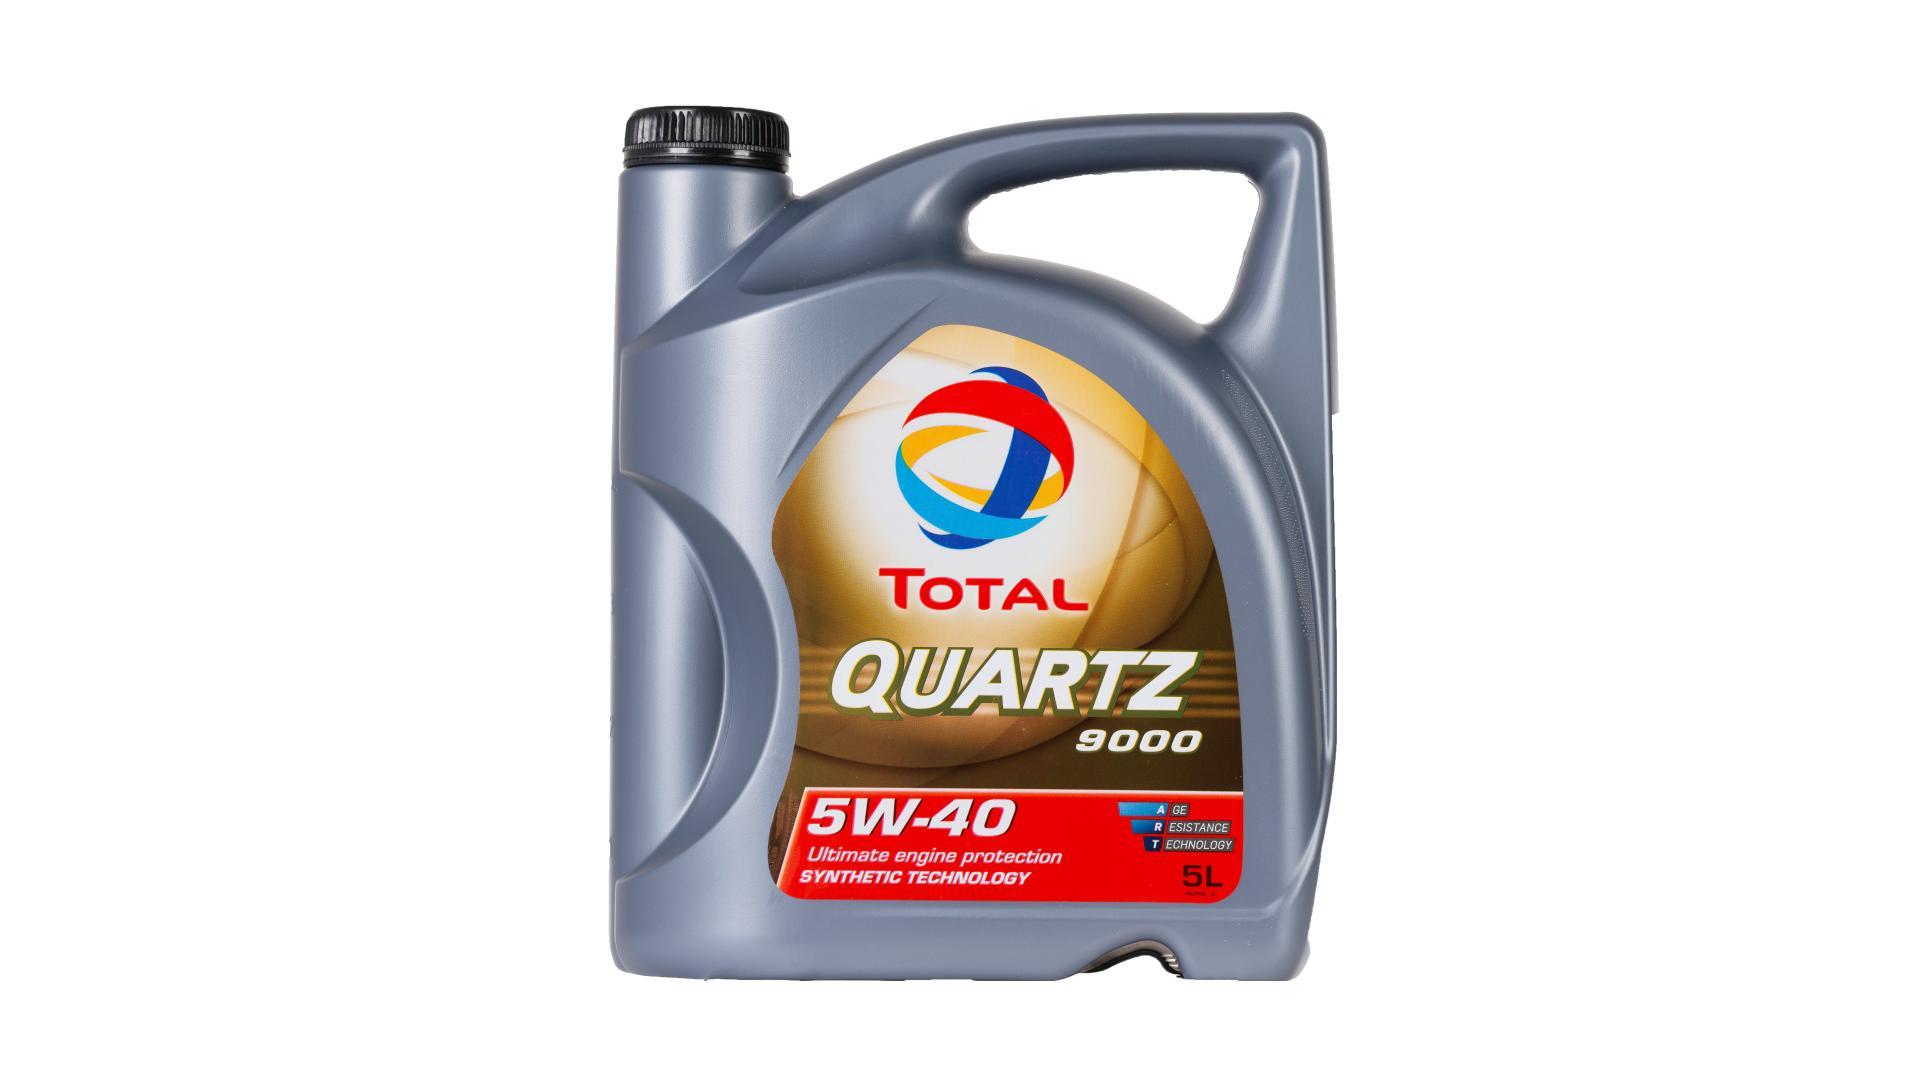 Total 5w-40 Quartz 9000 5L (148650)